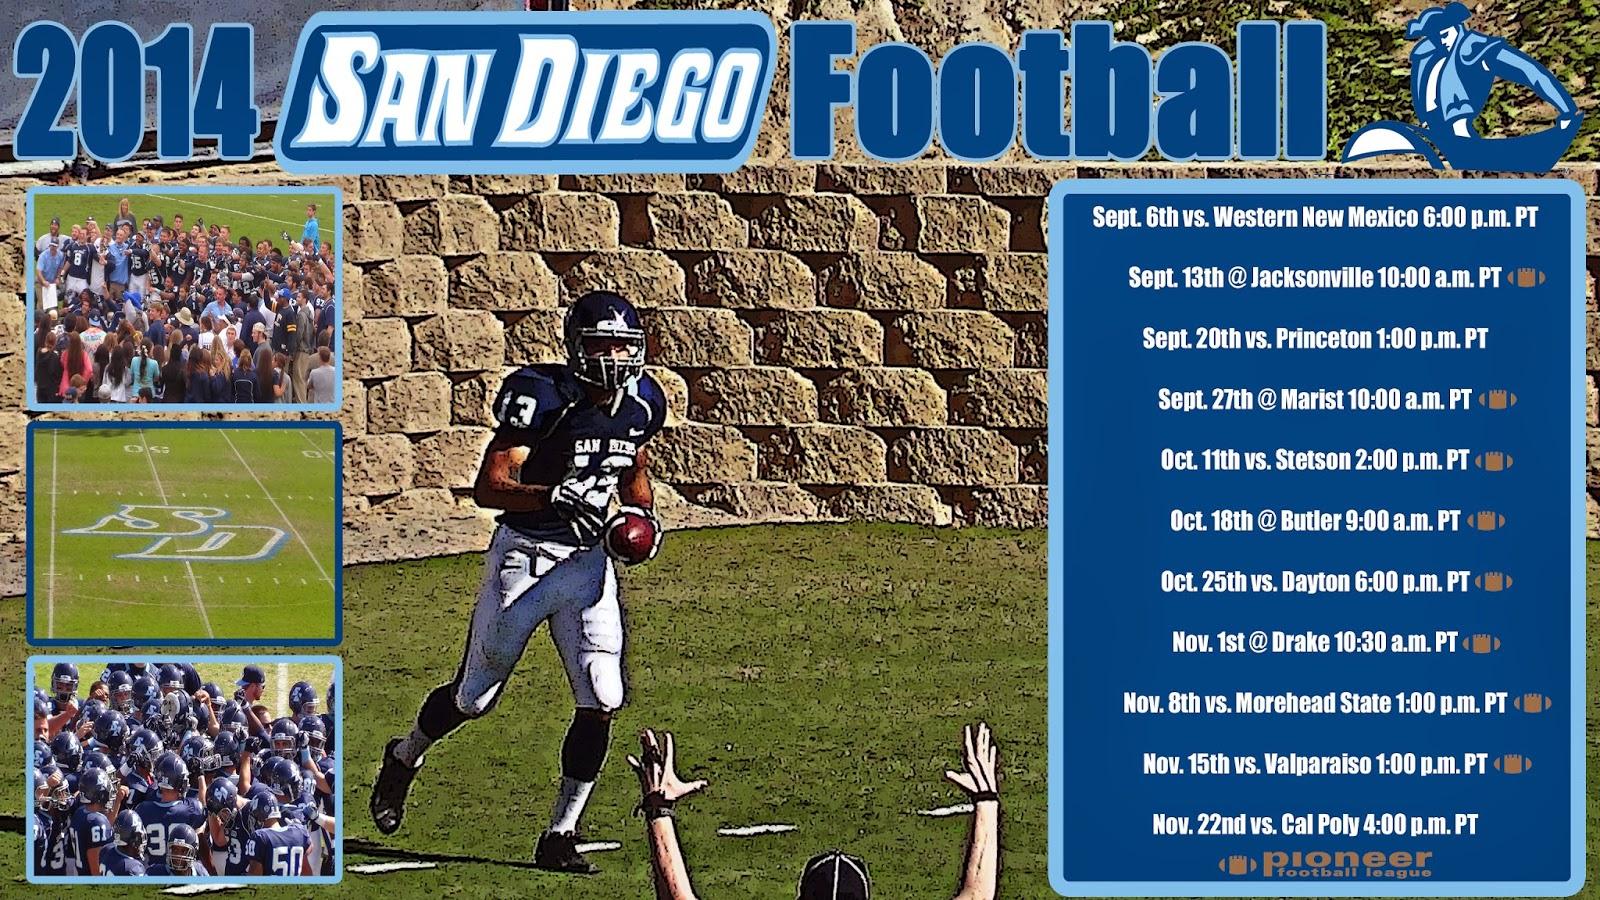 san diego football network: usd toreros 2014 football schedule